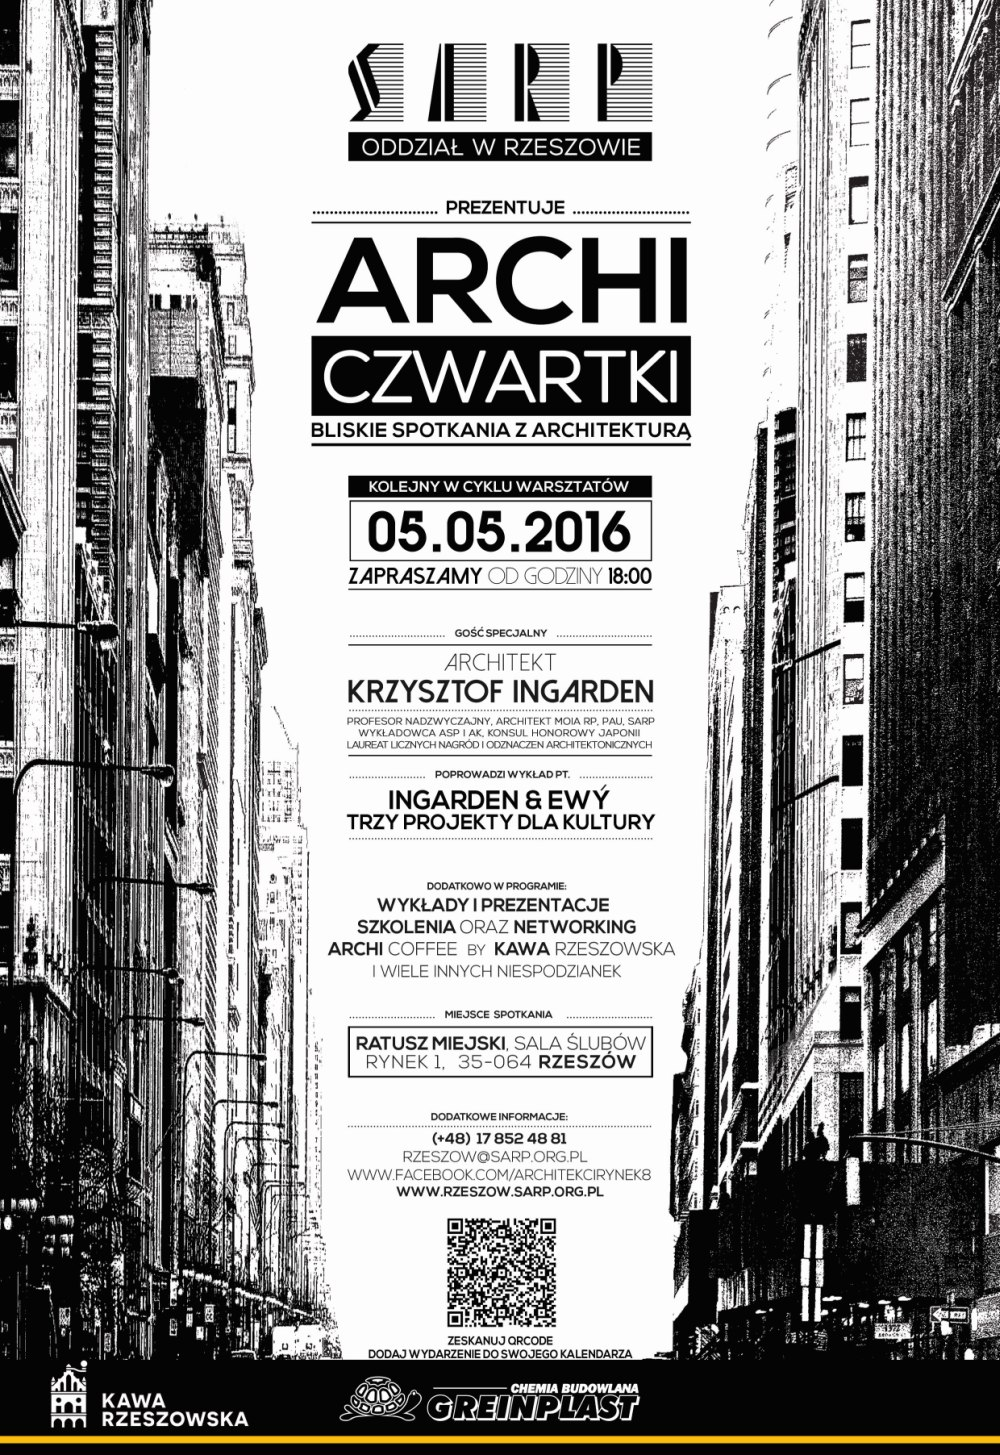 PLAKAT ARCHI CZWARTKI - 05-05-2016 Ingarden